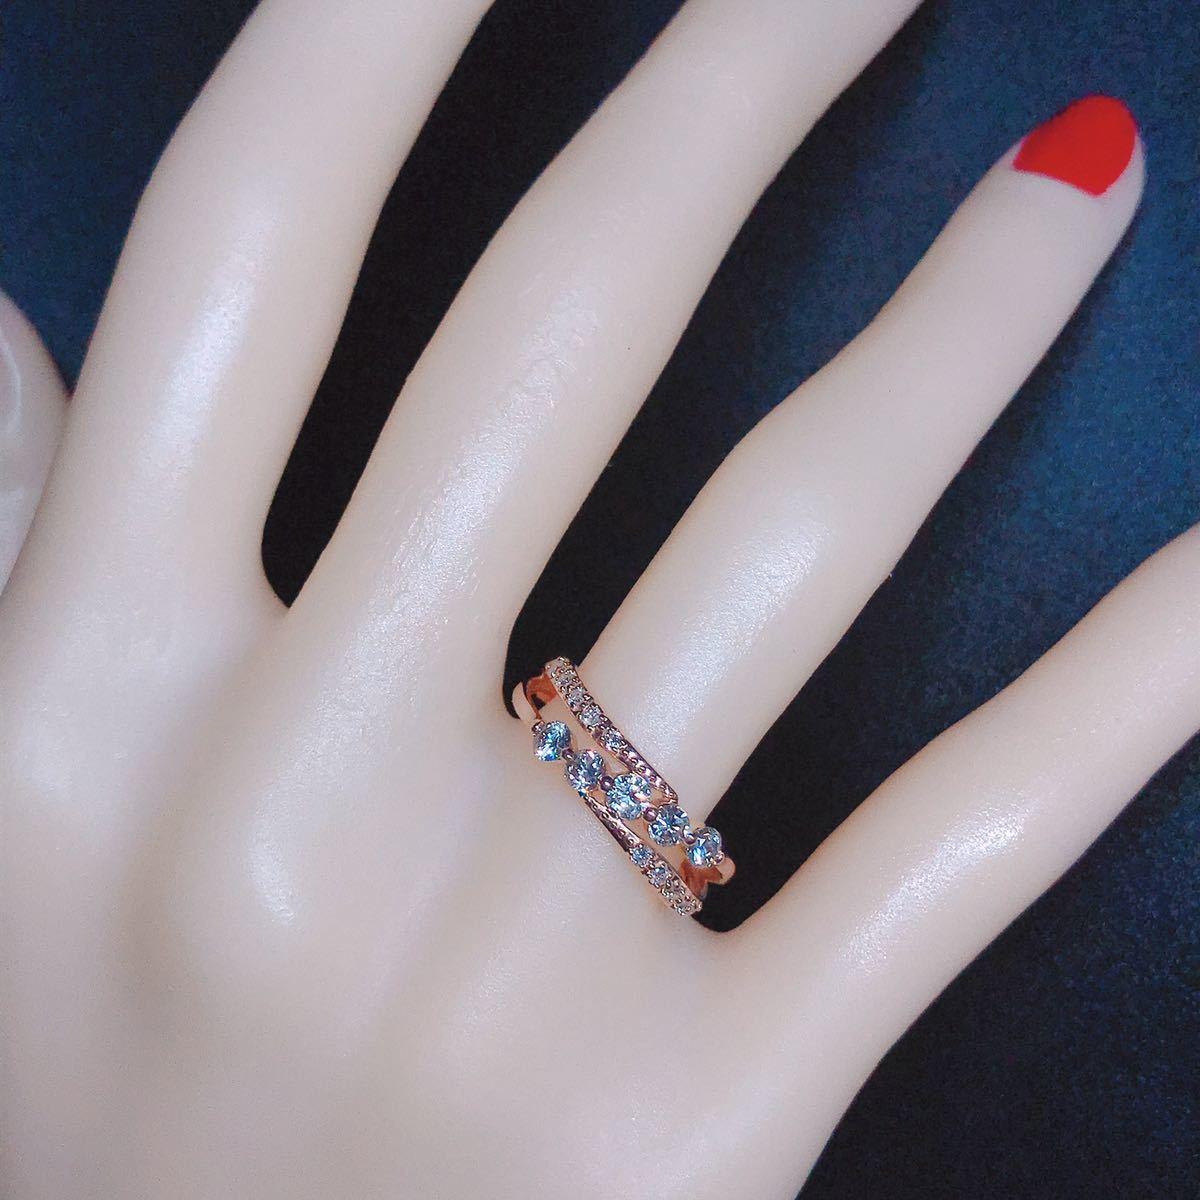 0.50ct ダイヤモンドリング K18 ダイヤ ウェーブ ミル打ち 上品 幅広_画像6